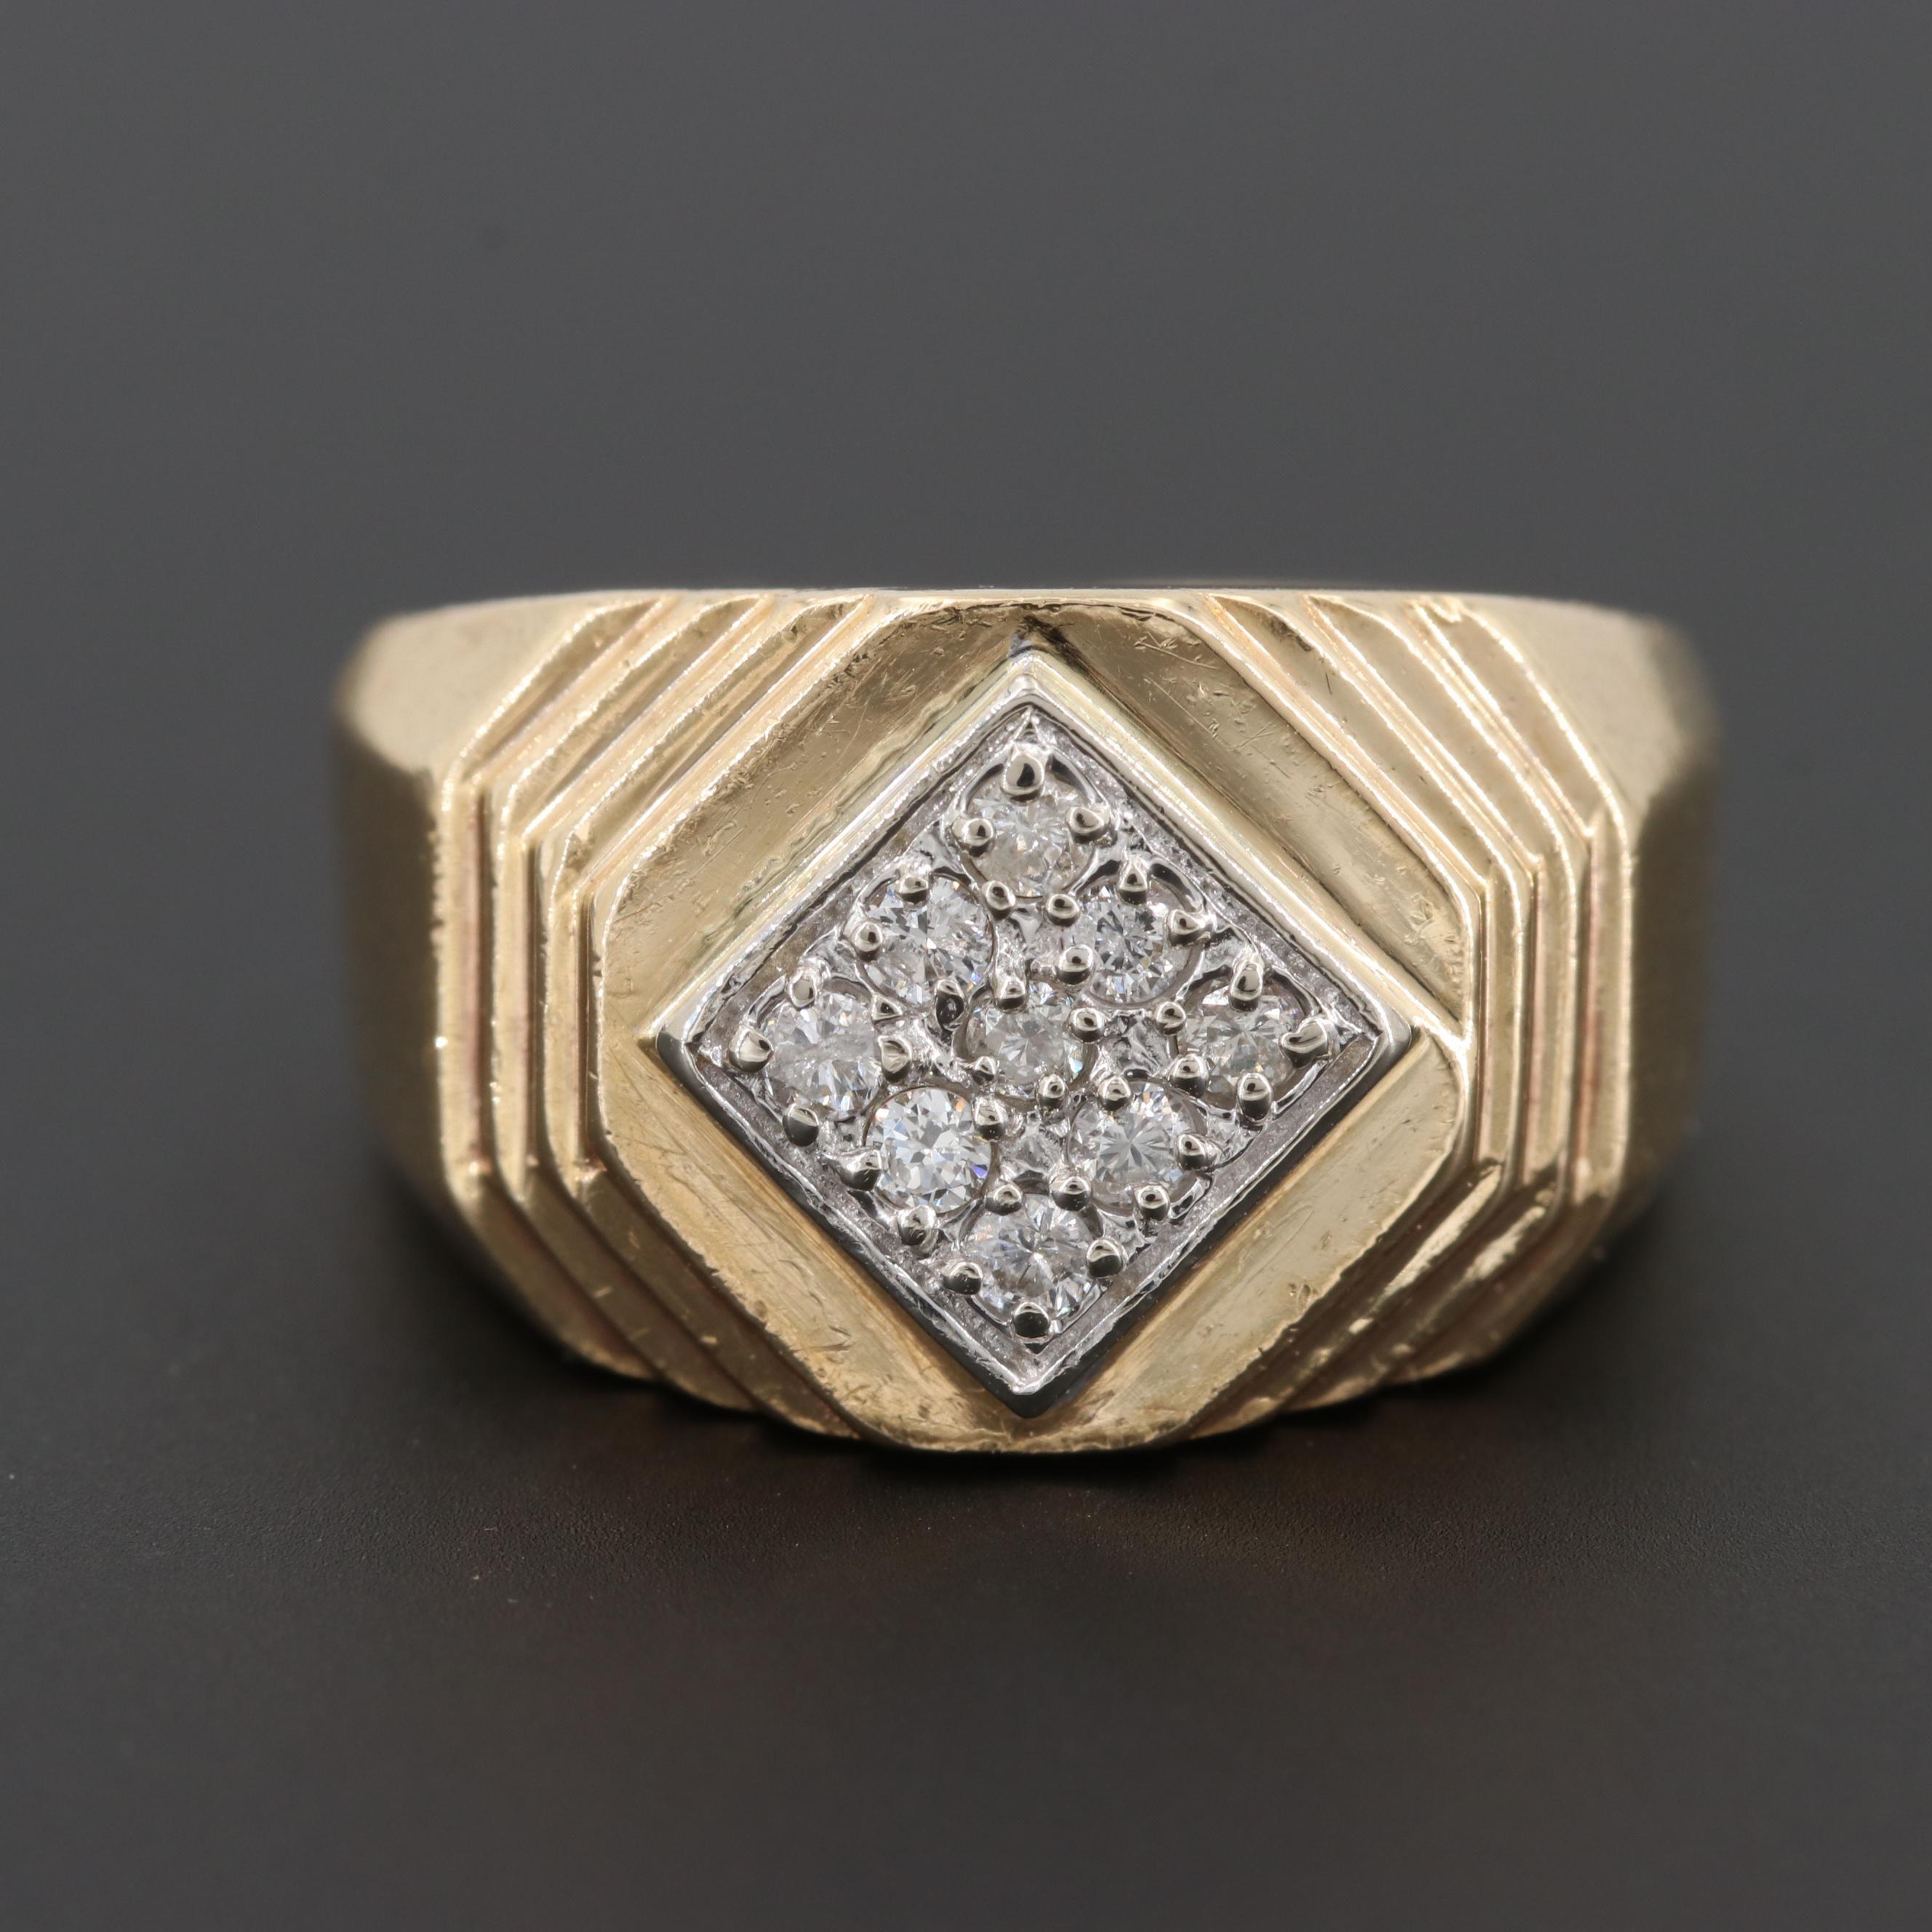 14K Yellow Gold Diamond Pavé Ring